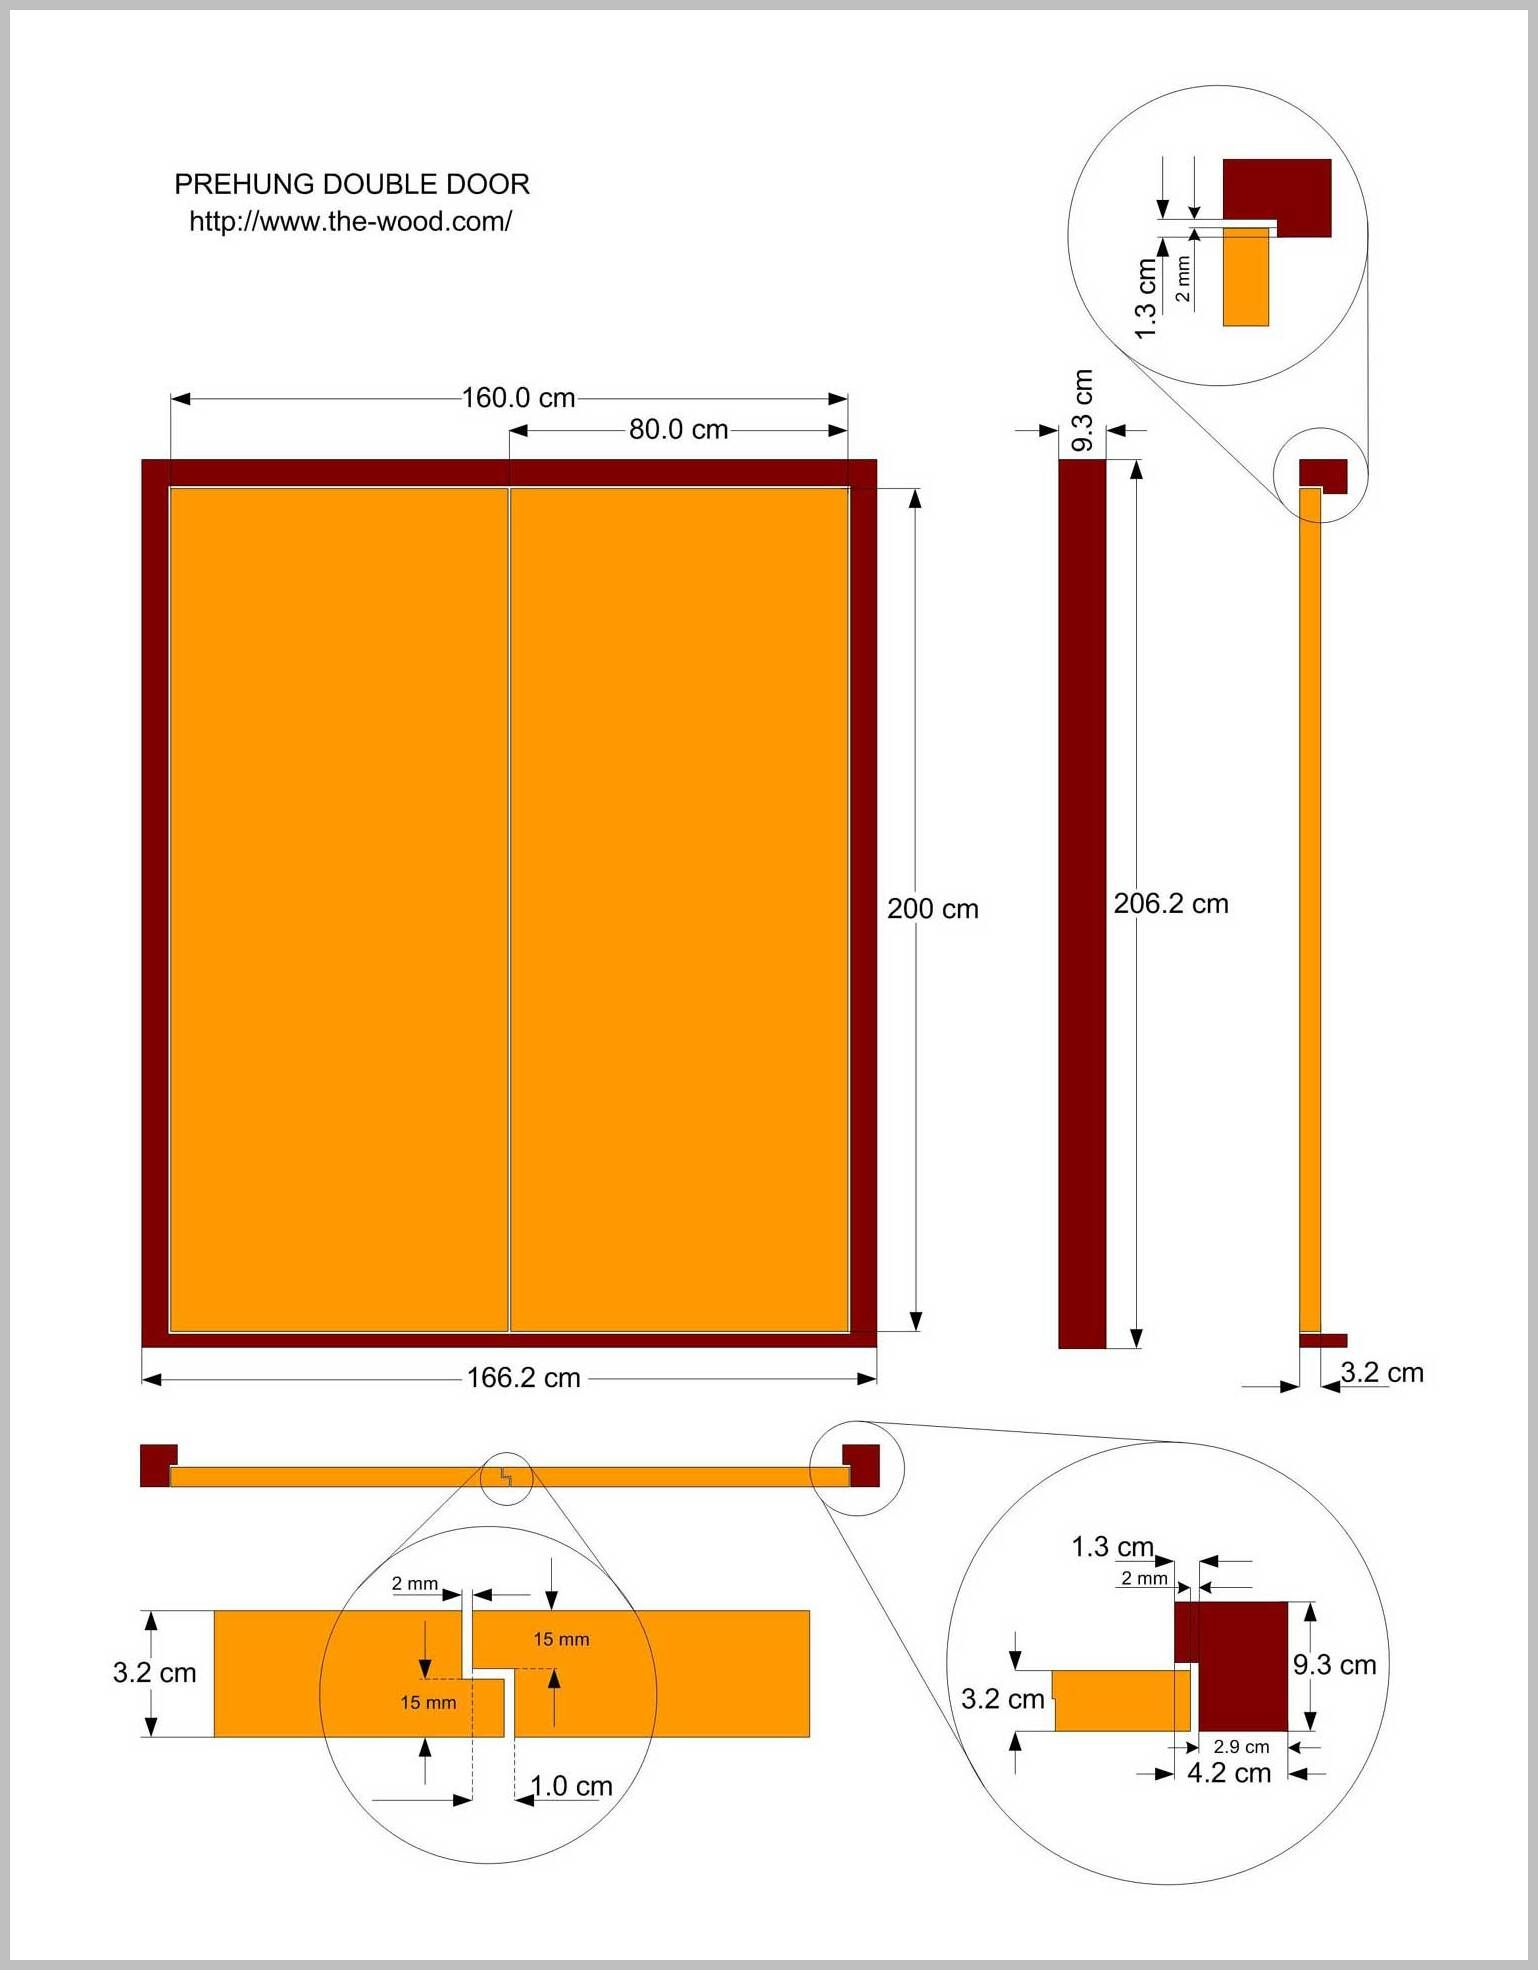 78 Reference Of Interior Double Door Frame Size In 2020 Double Doors Interior Wood Doors Interior Double Doors